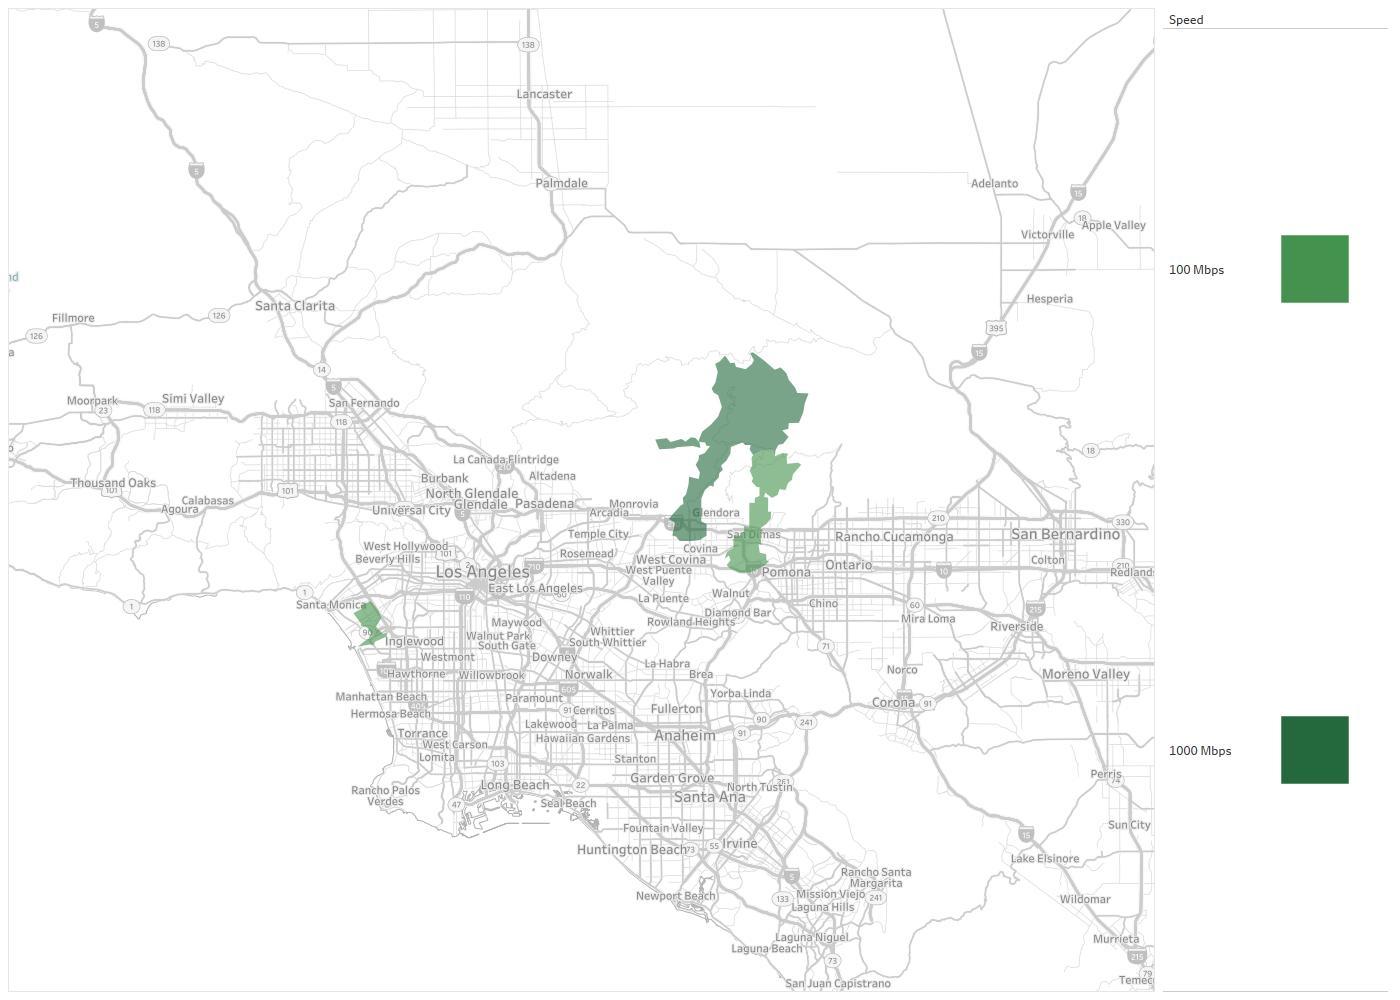 Southern California Edison Company Availability Areas & Coverage Map ...